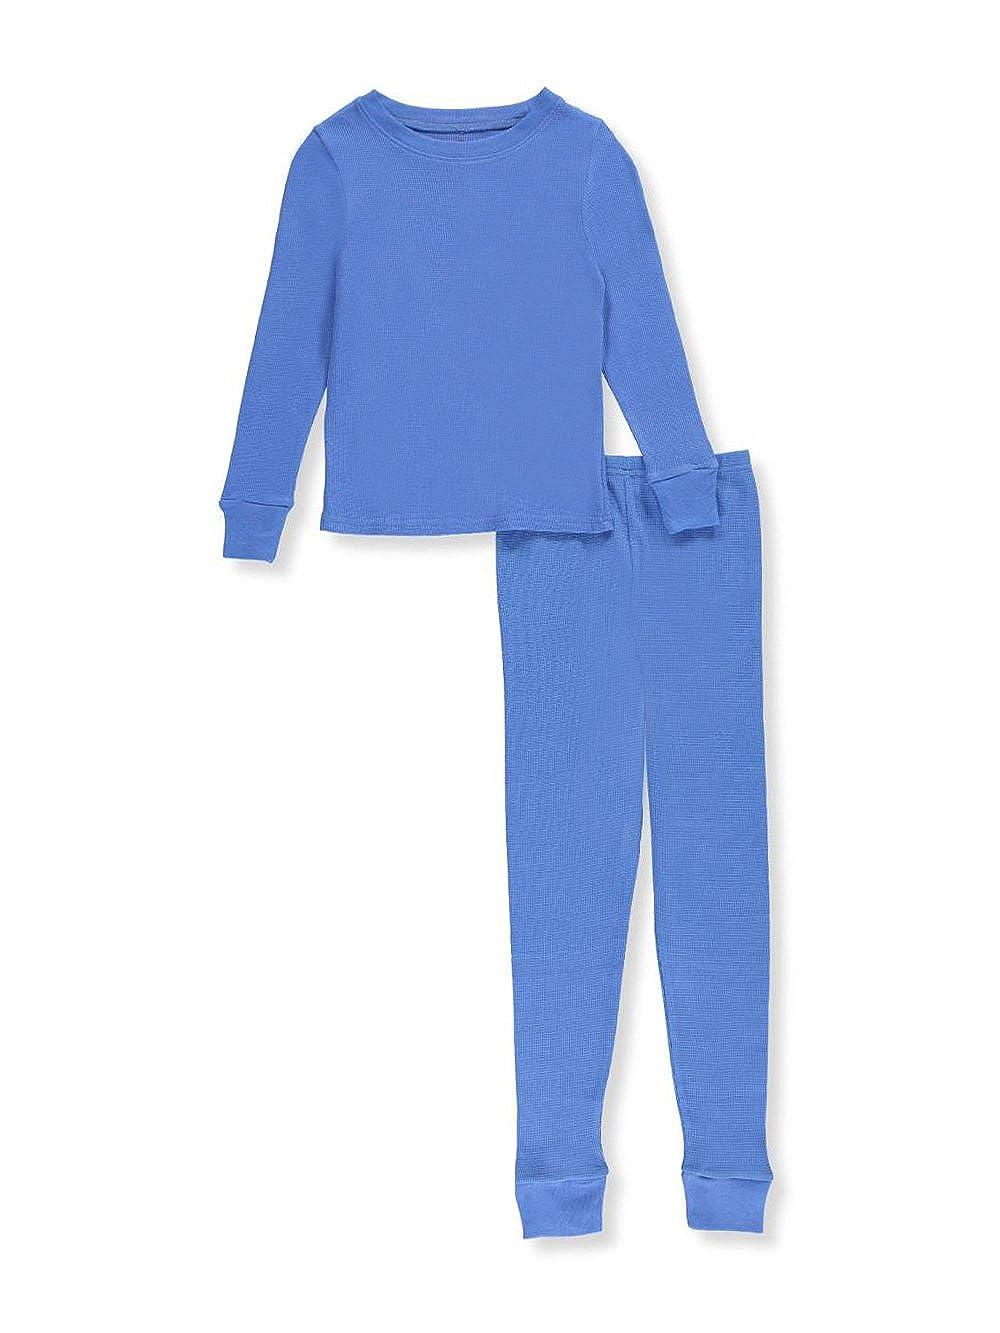 Ice2O Big Boys' 2-Piece Thermal Long Underwear Set 7-8 Ice20